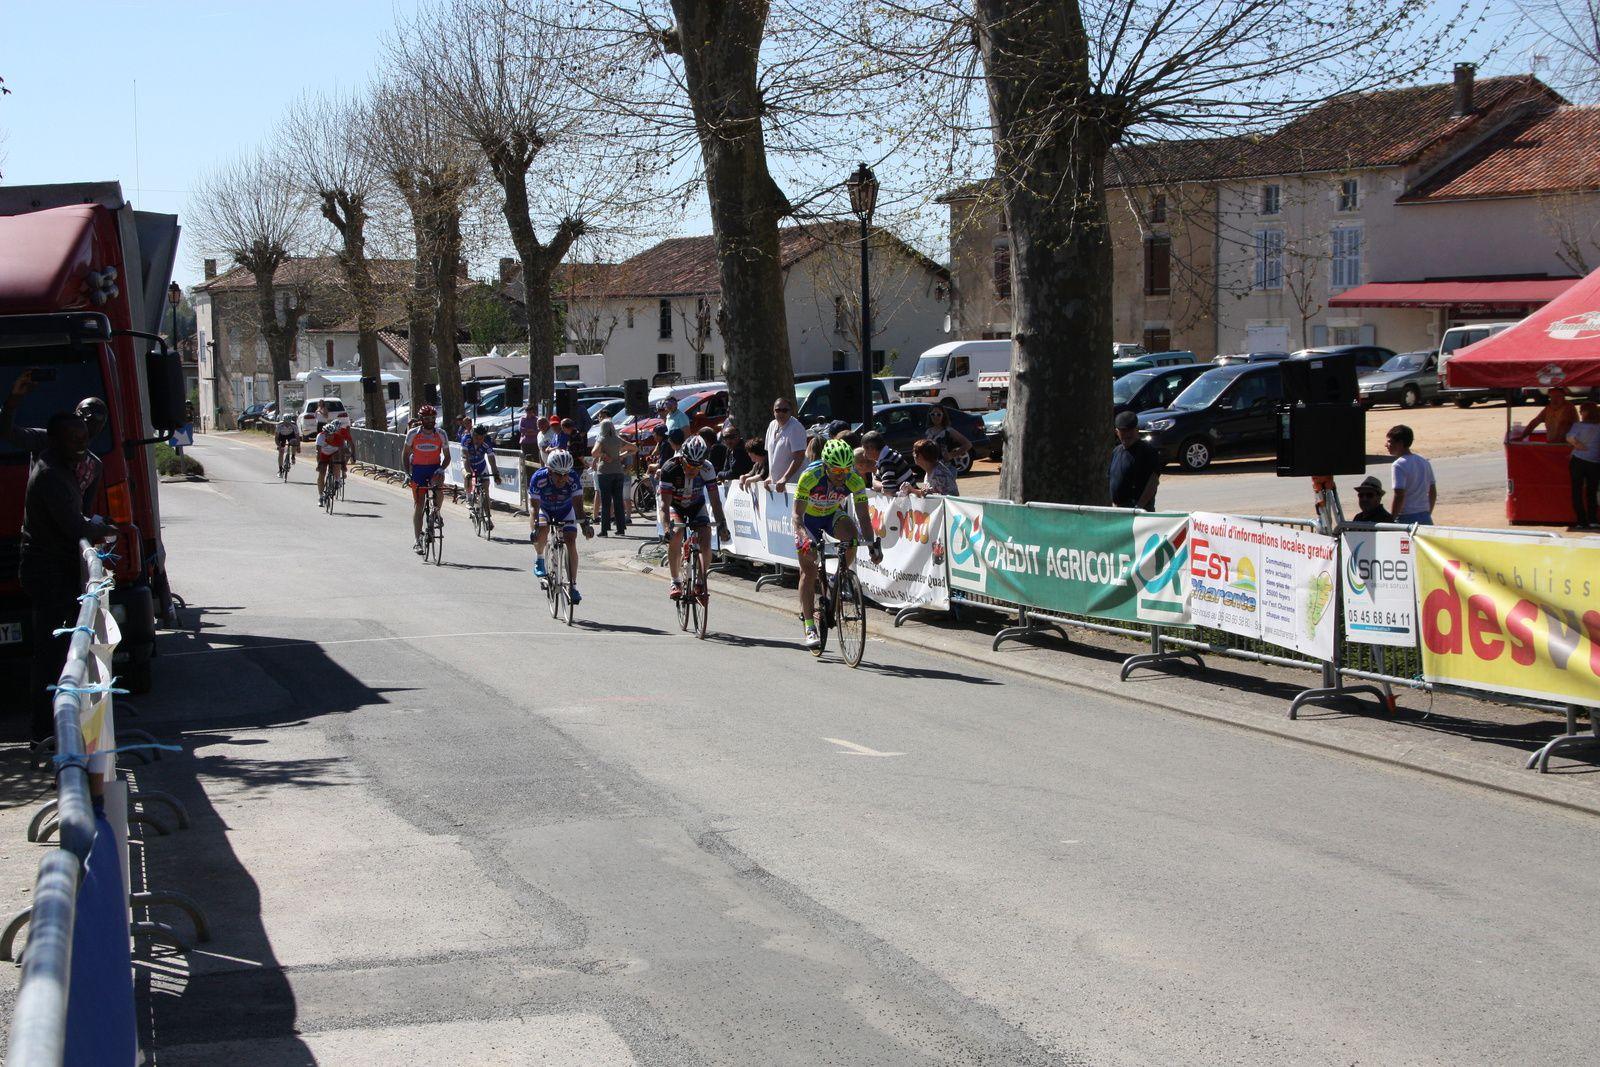 6e  Fabrice  CHARLOIS(AC  Jarnac-Aigre-Rouillac), 7e  Christian  LABROUSSE(R  Guataise), 8e  Paul  LOWRIE(G  Mansle)